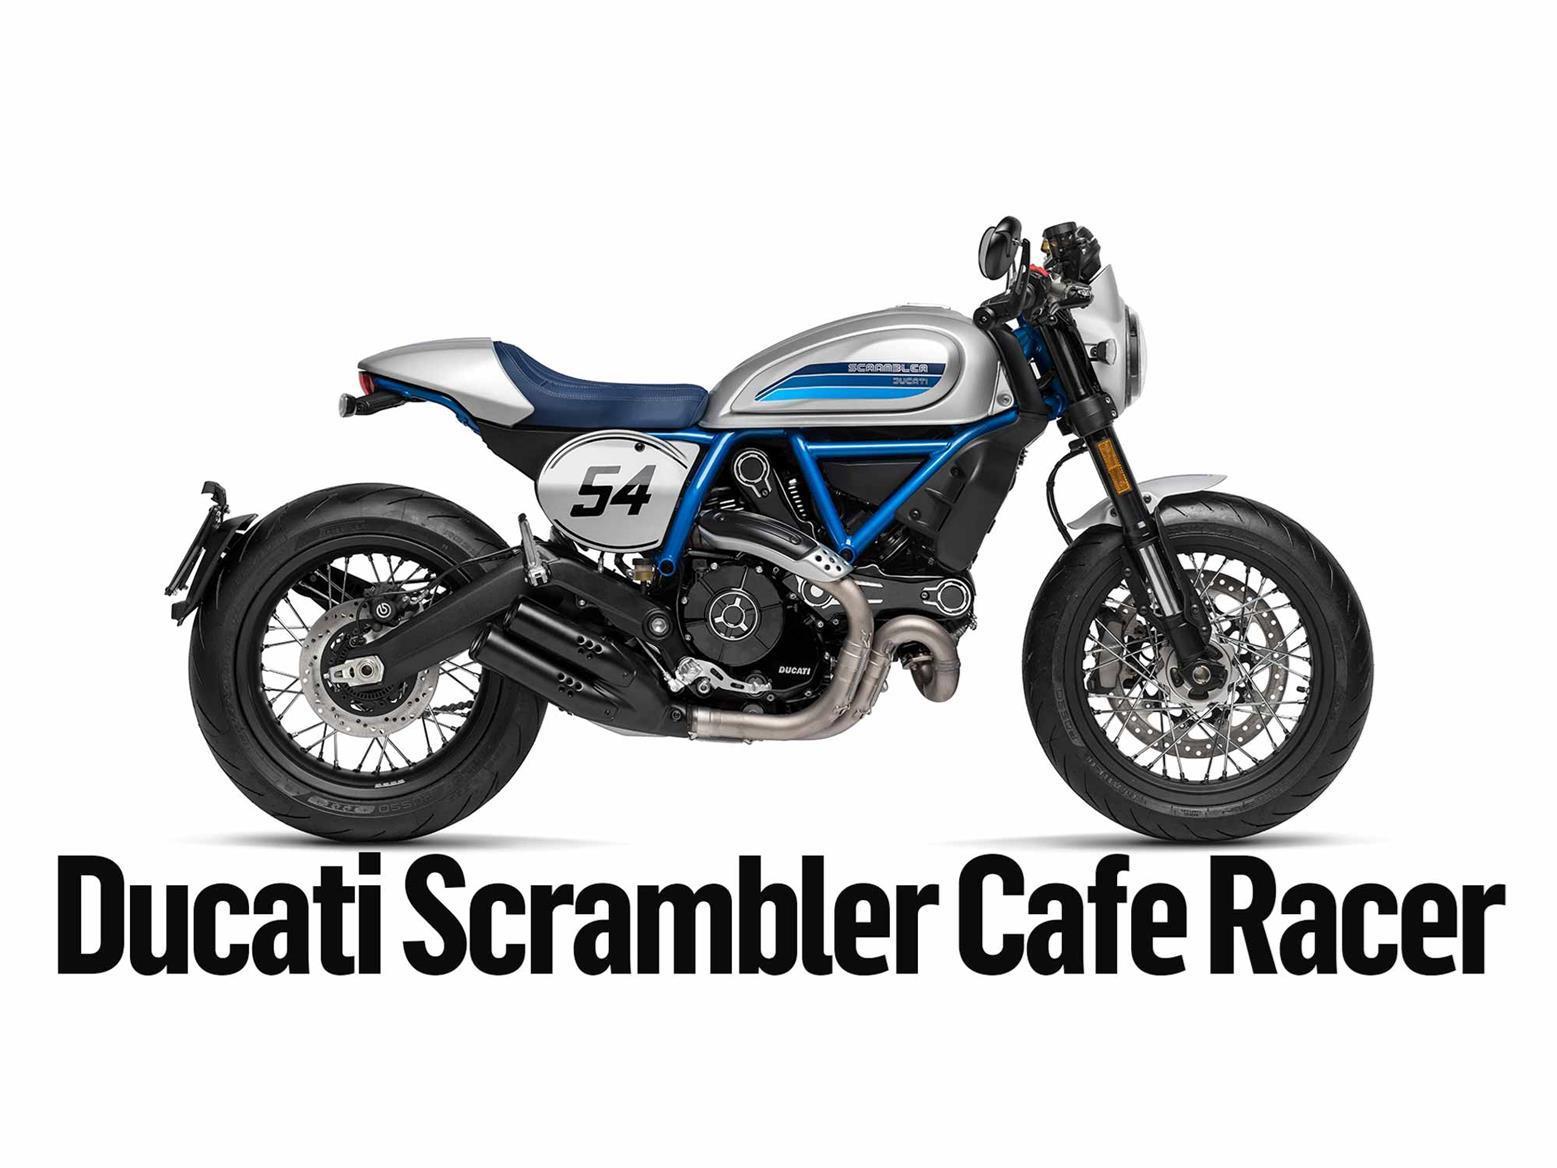 Read MCN's detailed Ducati Scrambler Café Racer long-term test here